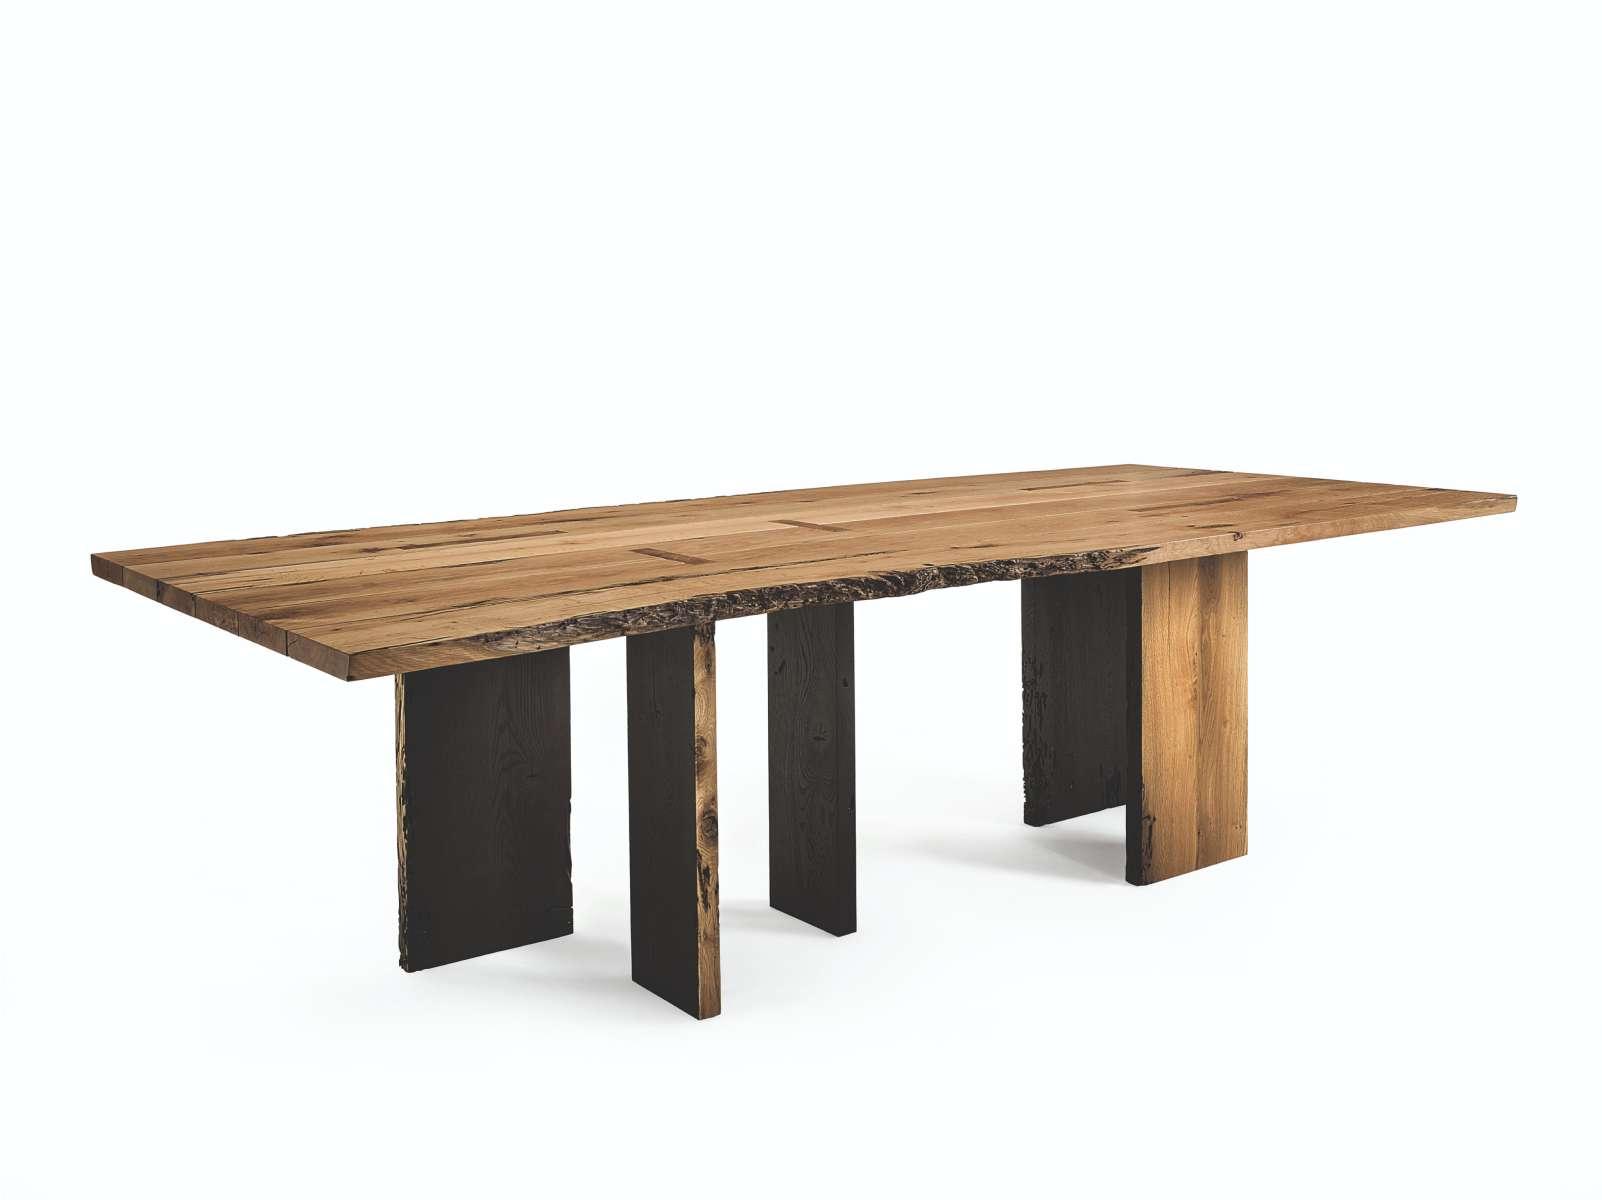 Studio Marco Piva – Product design – 611